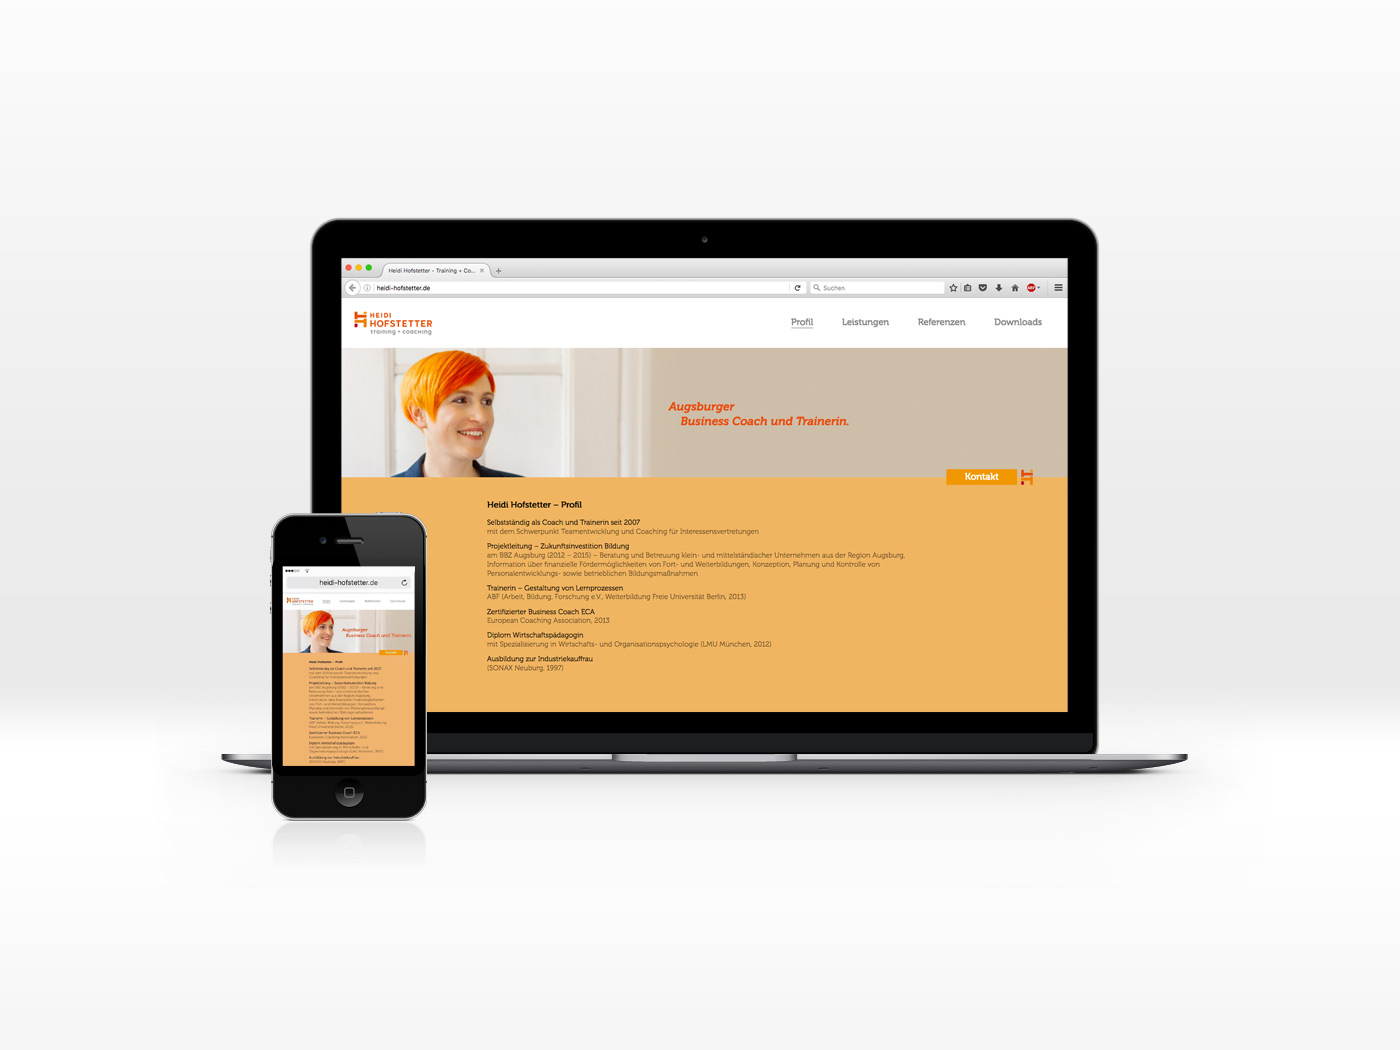 hofstetter_web_grafik_design_marina_grimme_augsburg